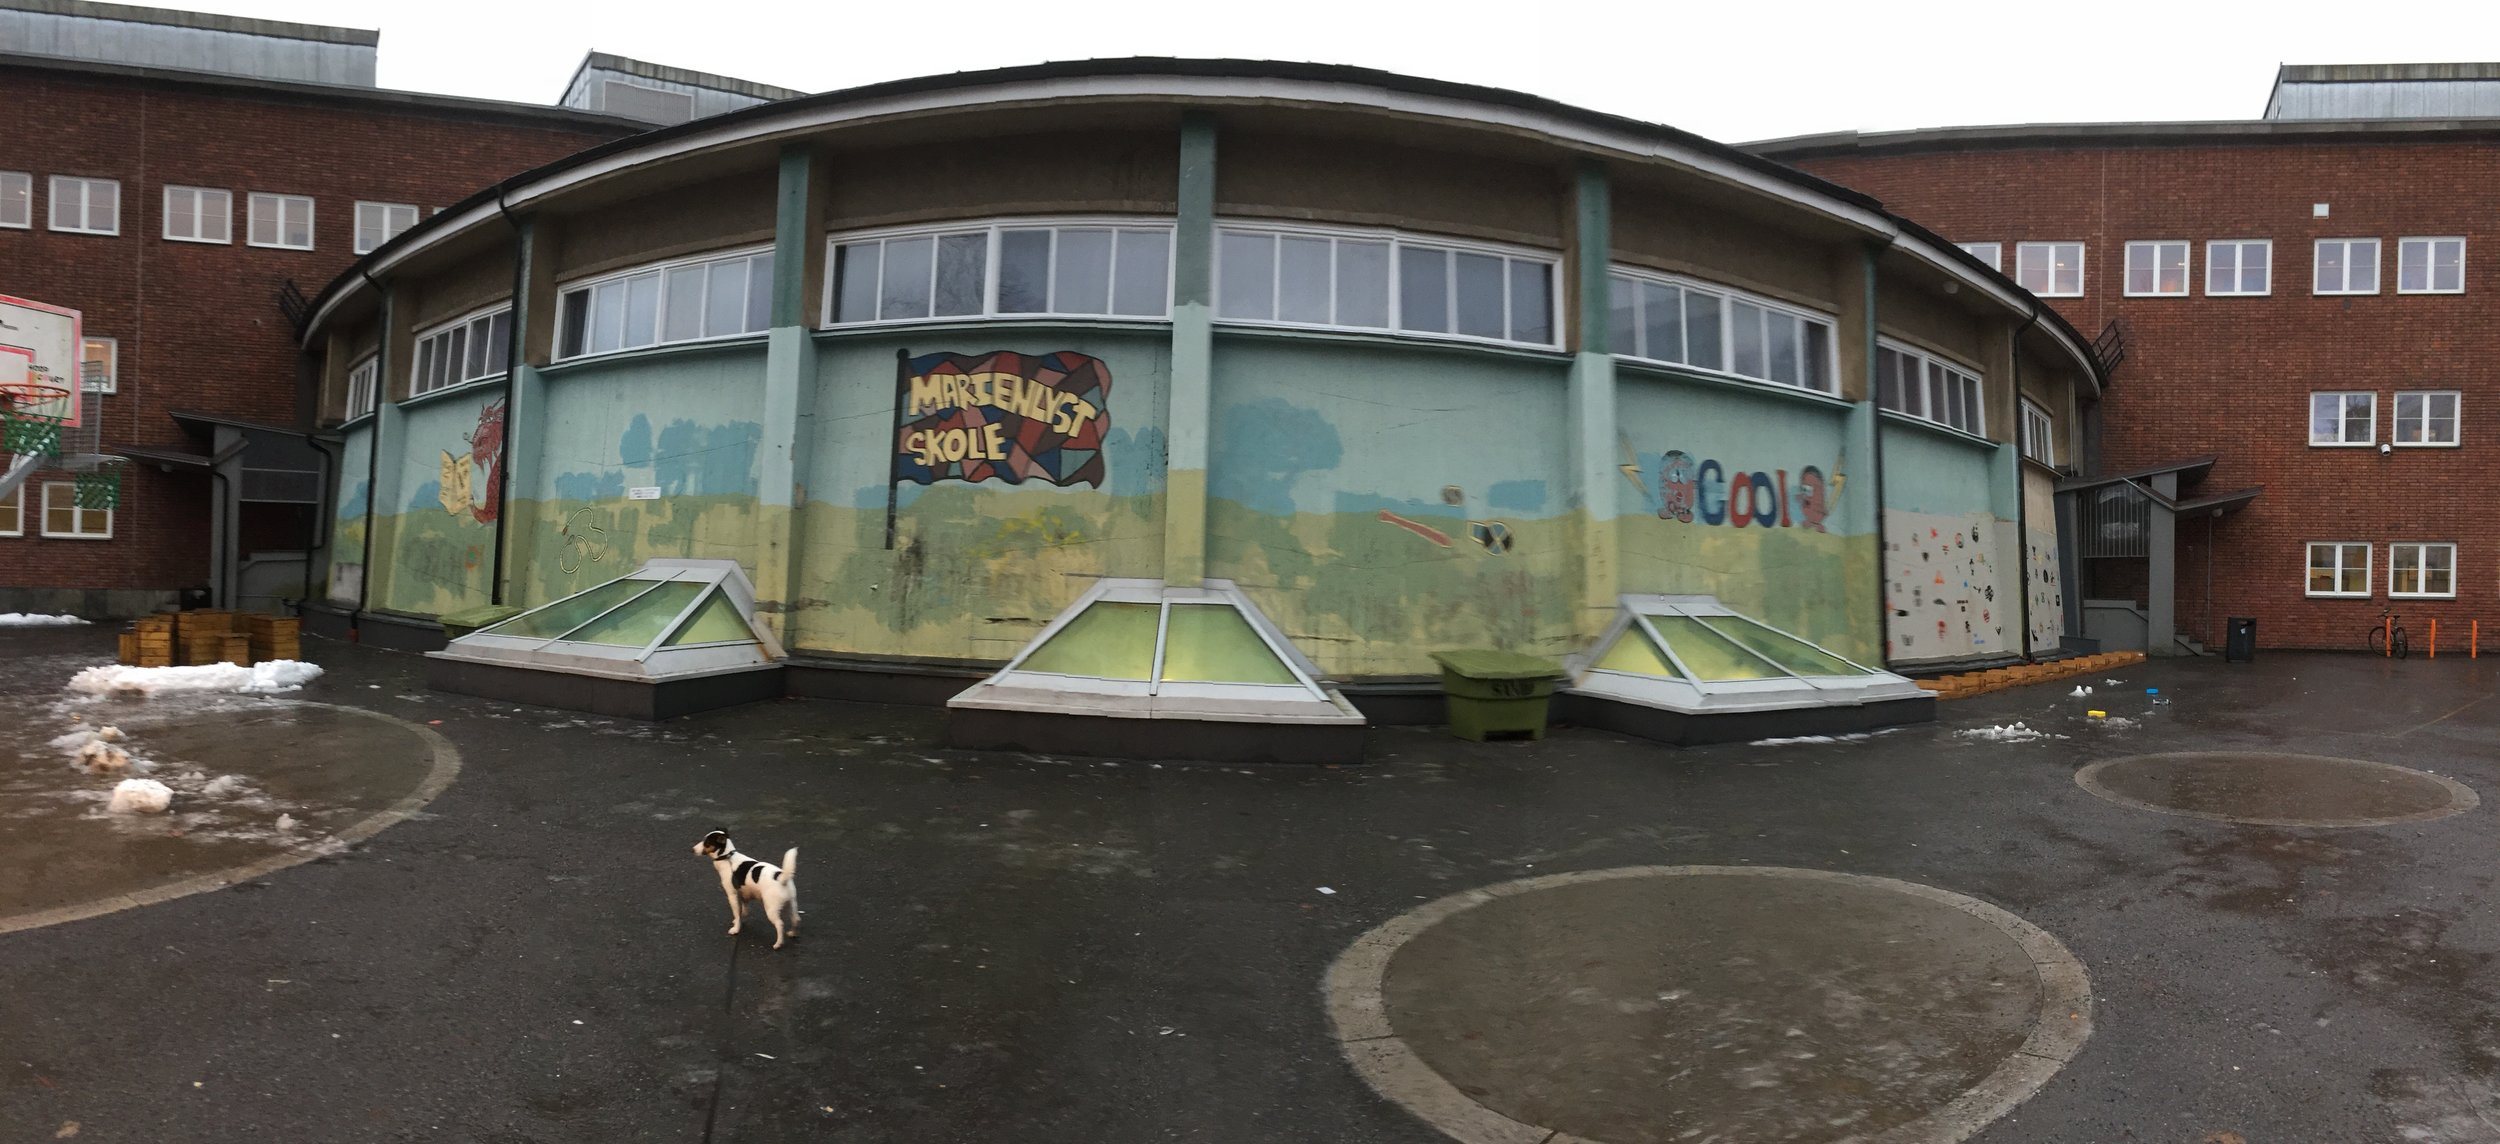 Her er aulaveggen i skolegården for ungdomsskolen på Marienlyst. Mitt største lerret til nå - 130m2!